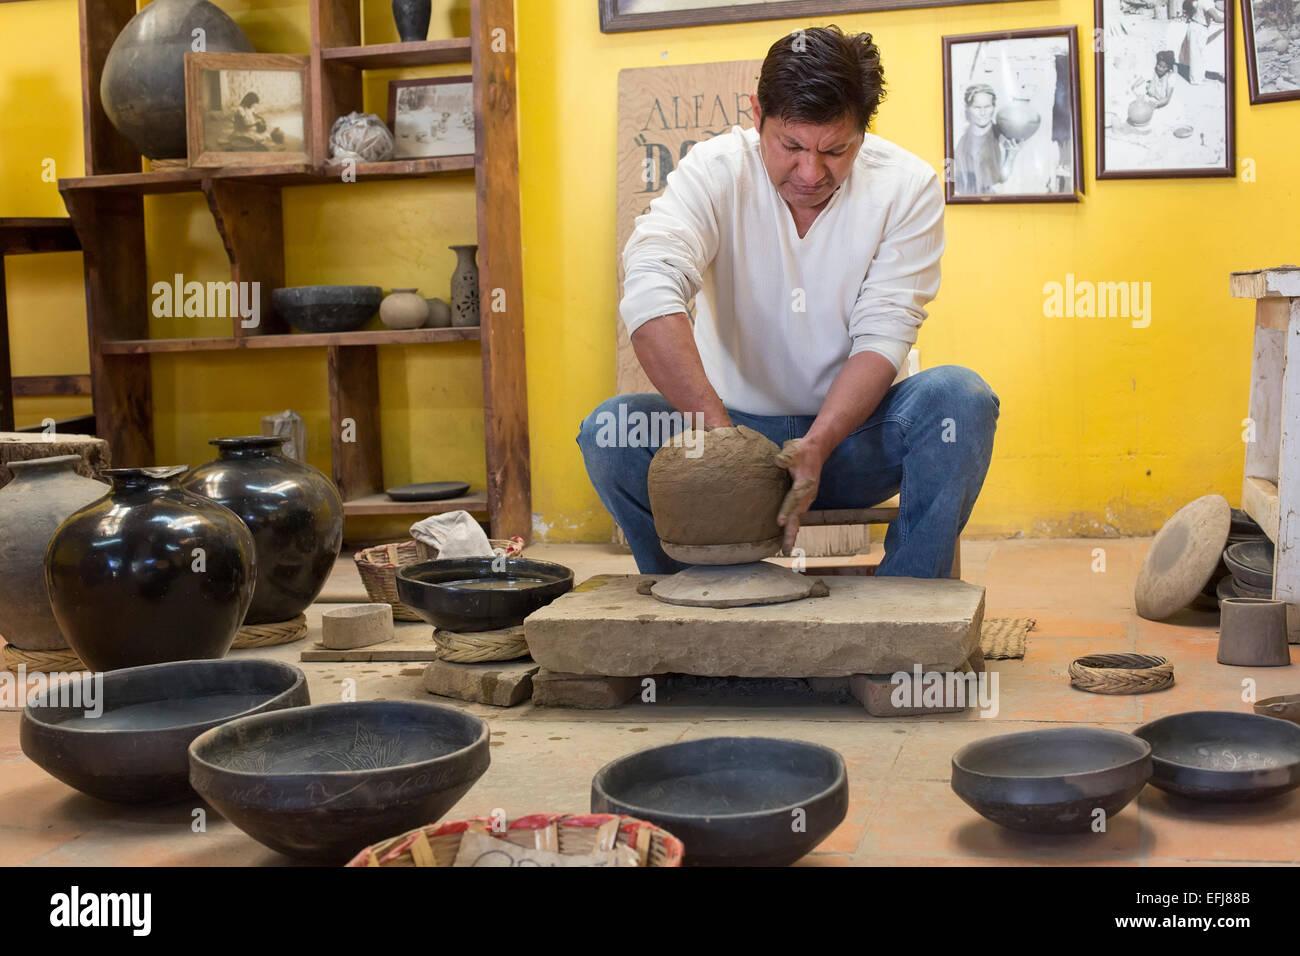 San Bartolo Coyotepec, Mexiko - Javier Nieto Castillo zeigt die Herstellung von Keramik im Studio Doña Rosa. Stockbild